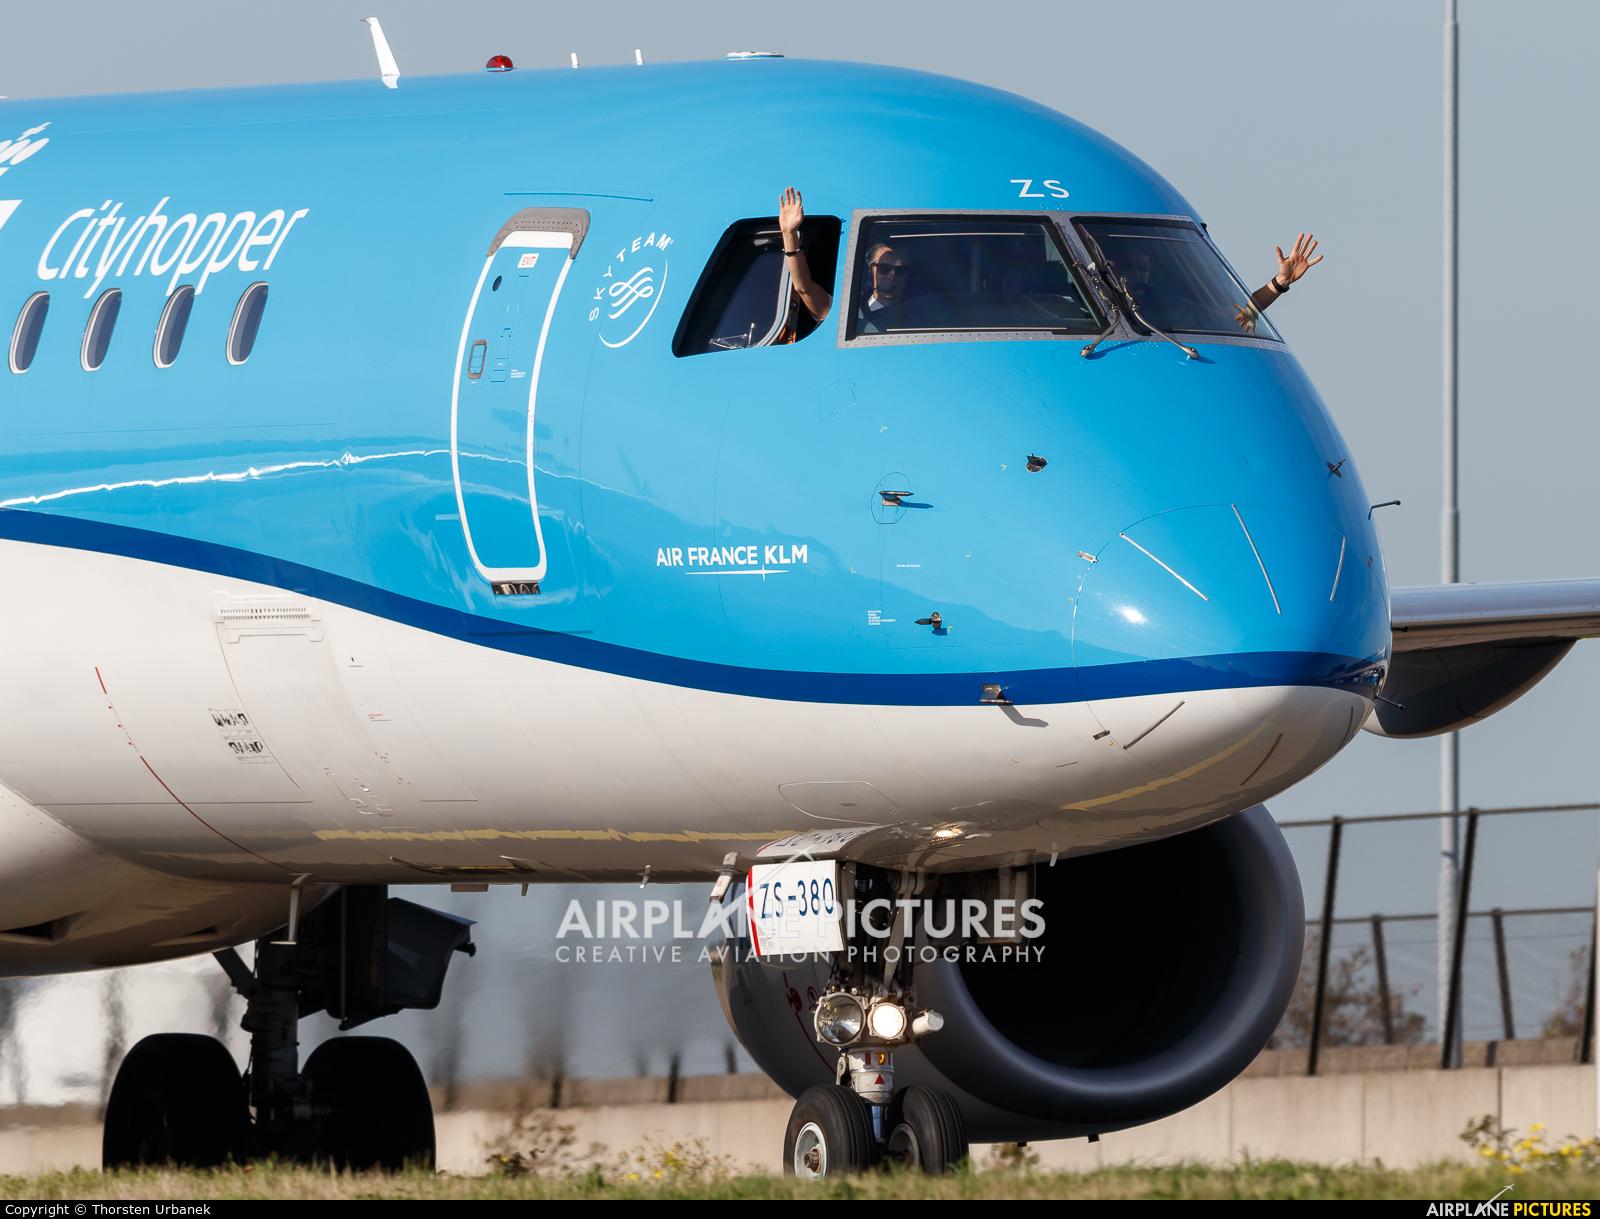 KLM Cityhopper PH-EZS aircraft at Amsterdam - Schiphol